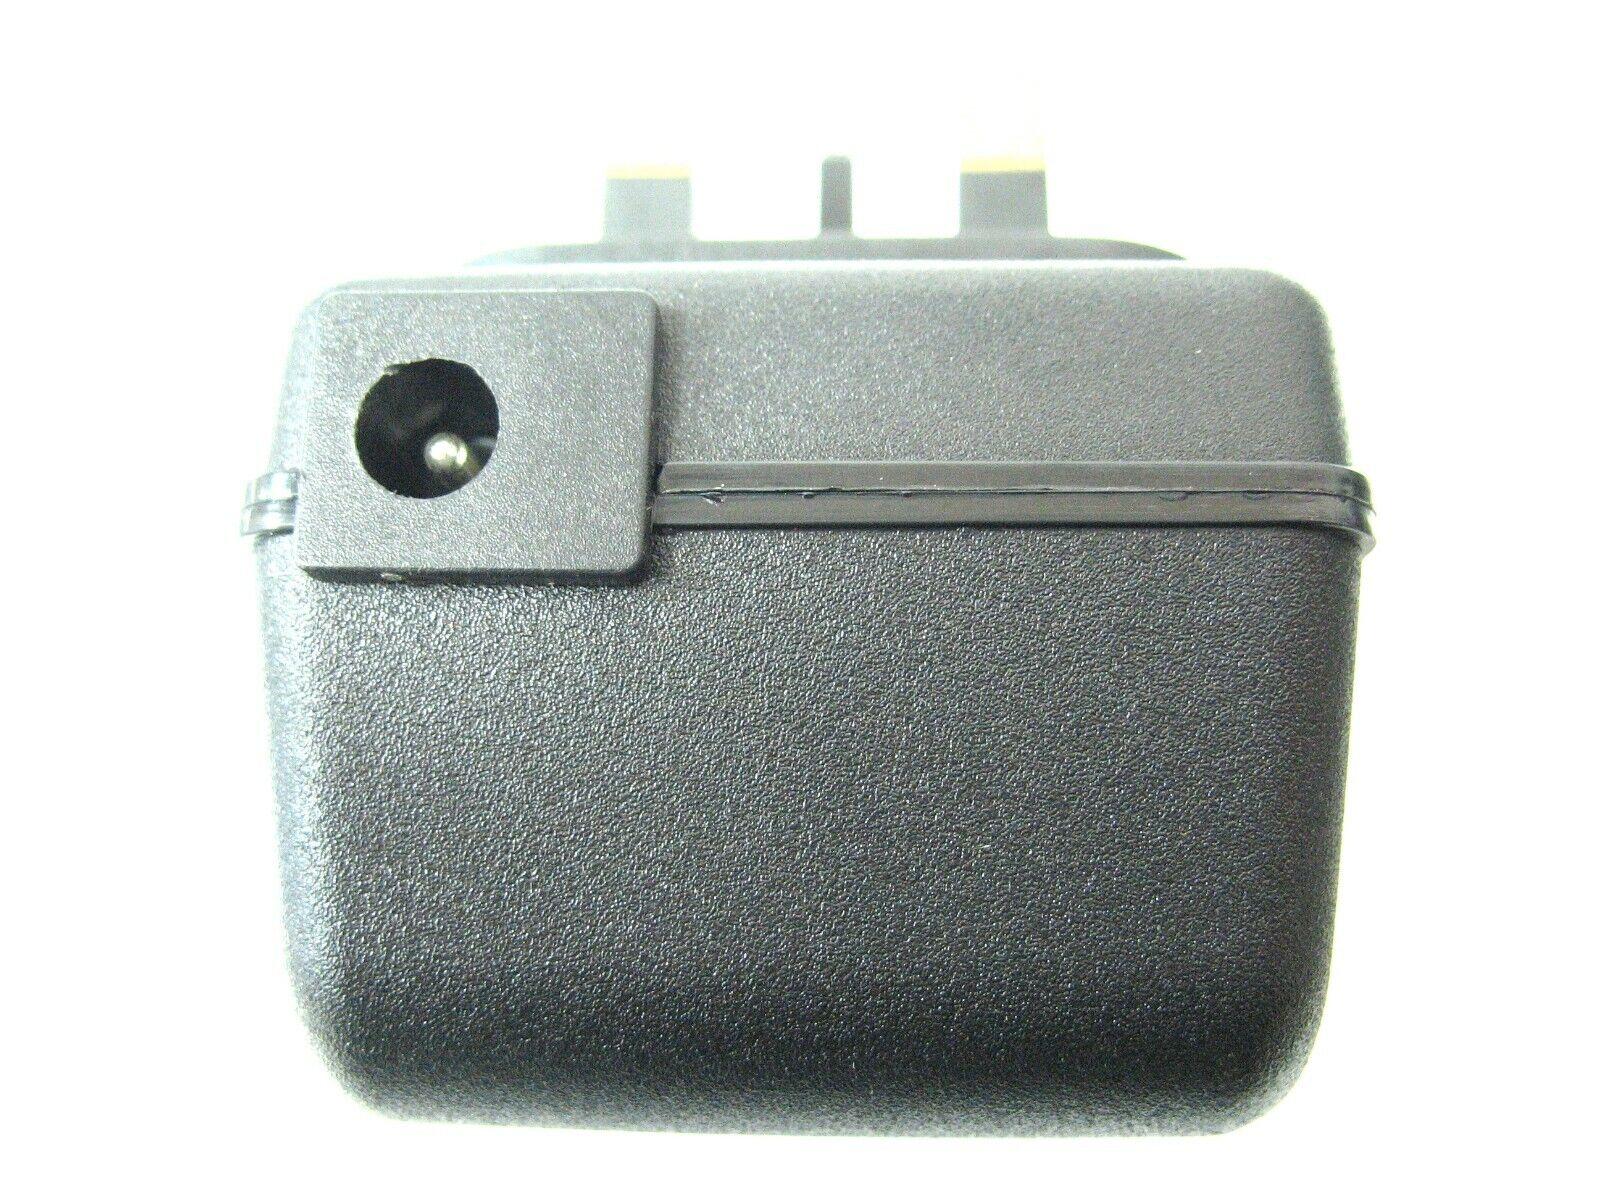 0.15 amp 24 volt Socket AC-AC (AC Output) Power Adaptor/Supply/Charger 3.6 watt